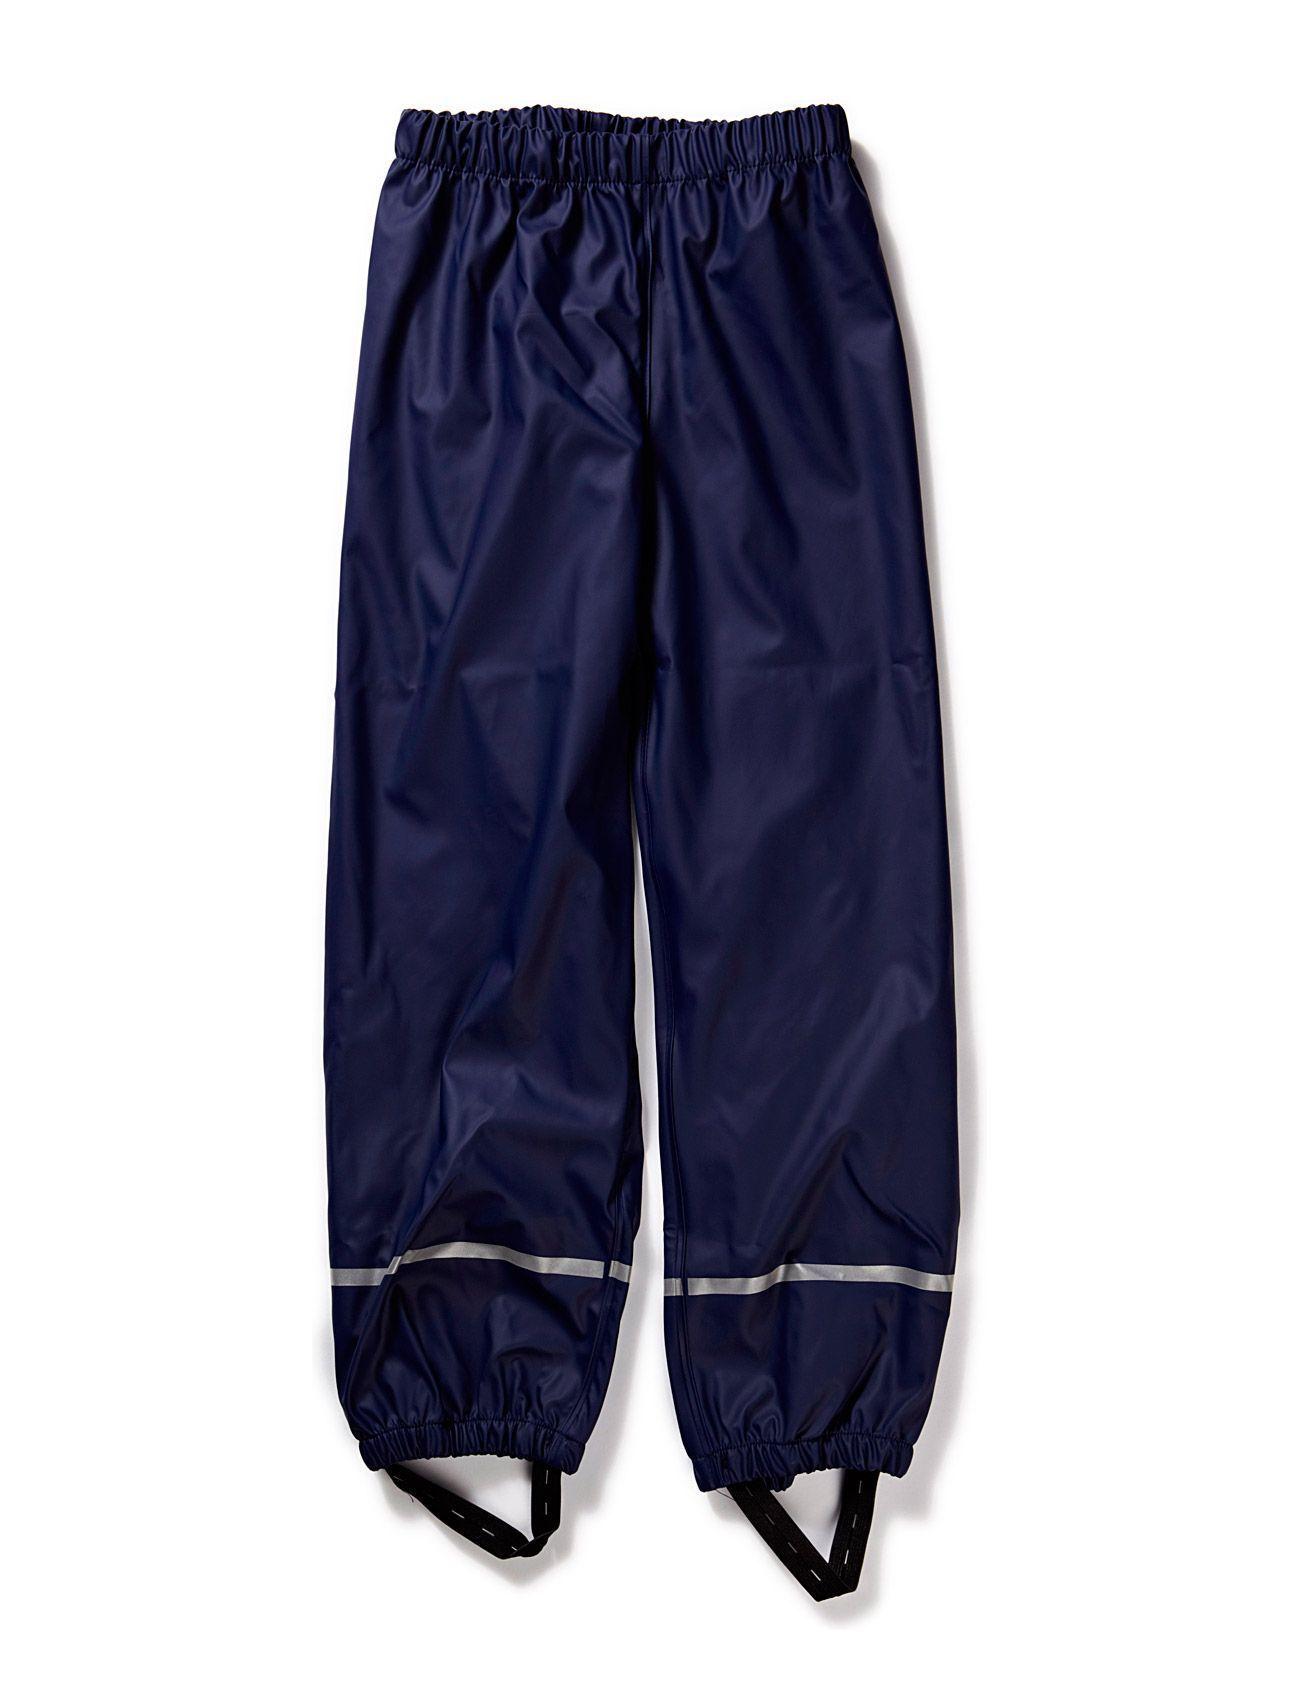 Paco 210 - Rain Pants Lego wear Regntøj til Børn i Midnight Blue